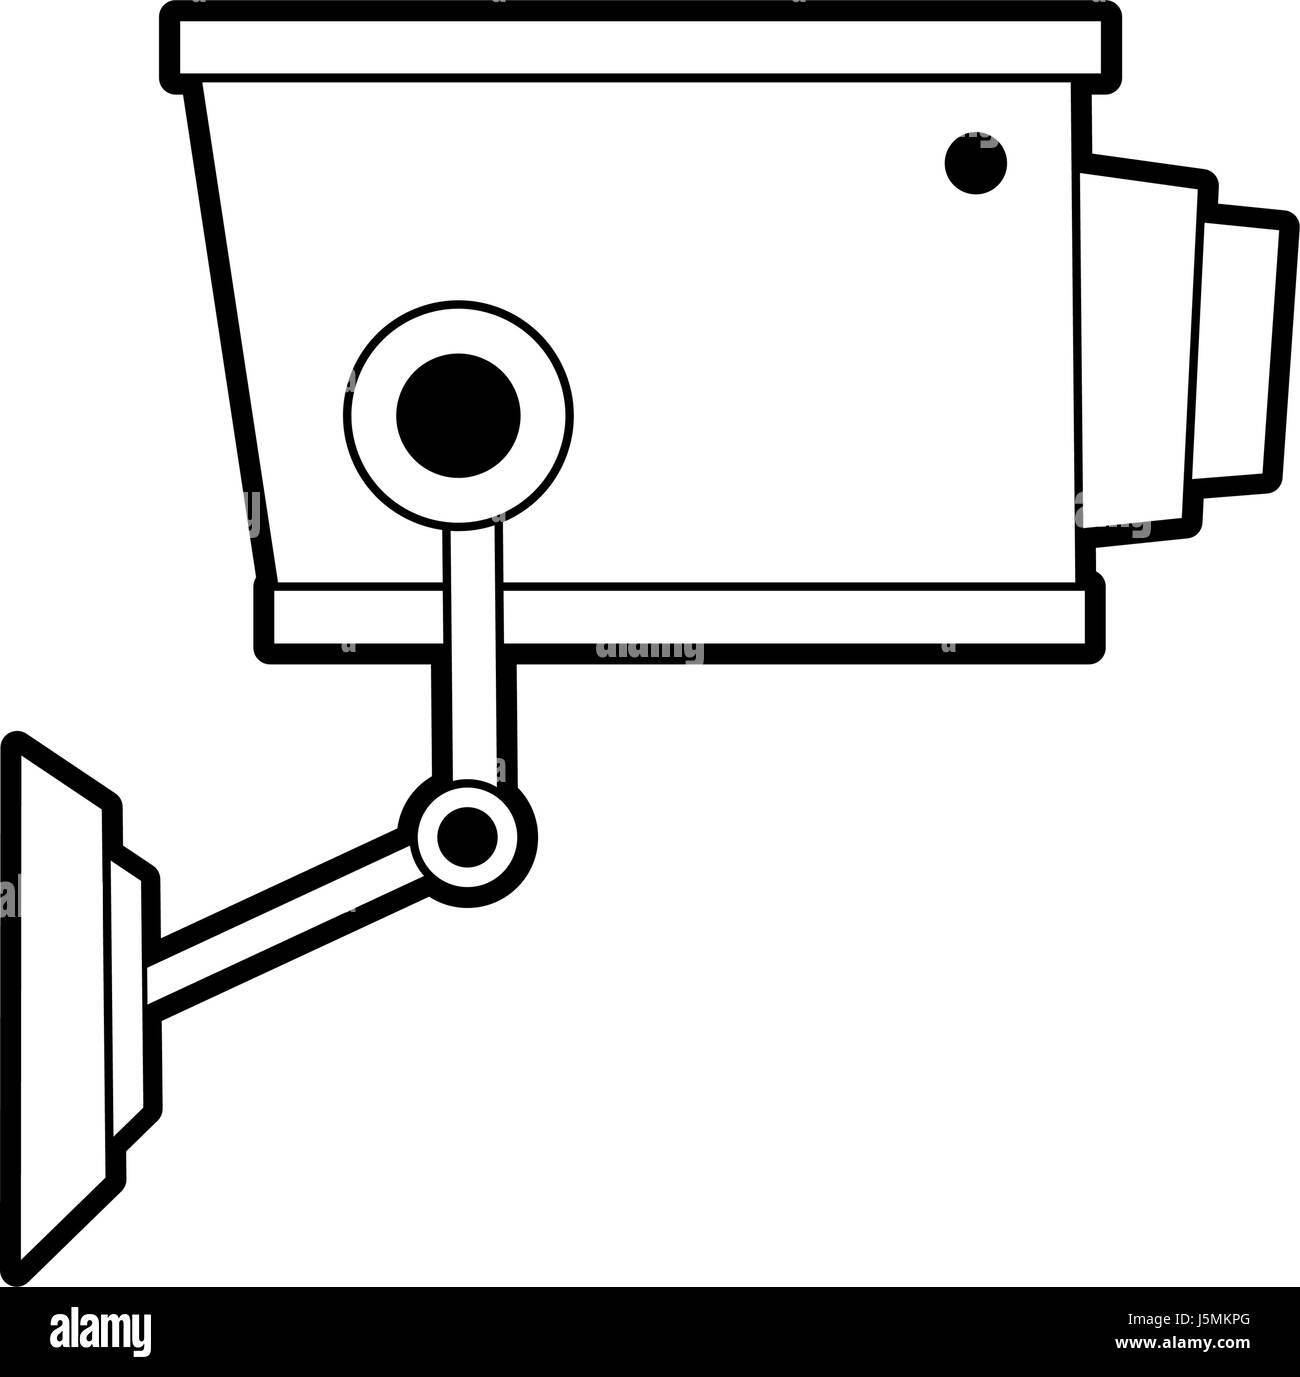 sketch silhouette image infrared surveillance camera icon Stock Vector